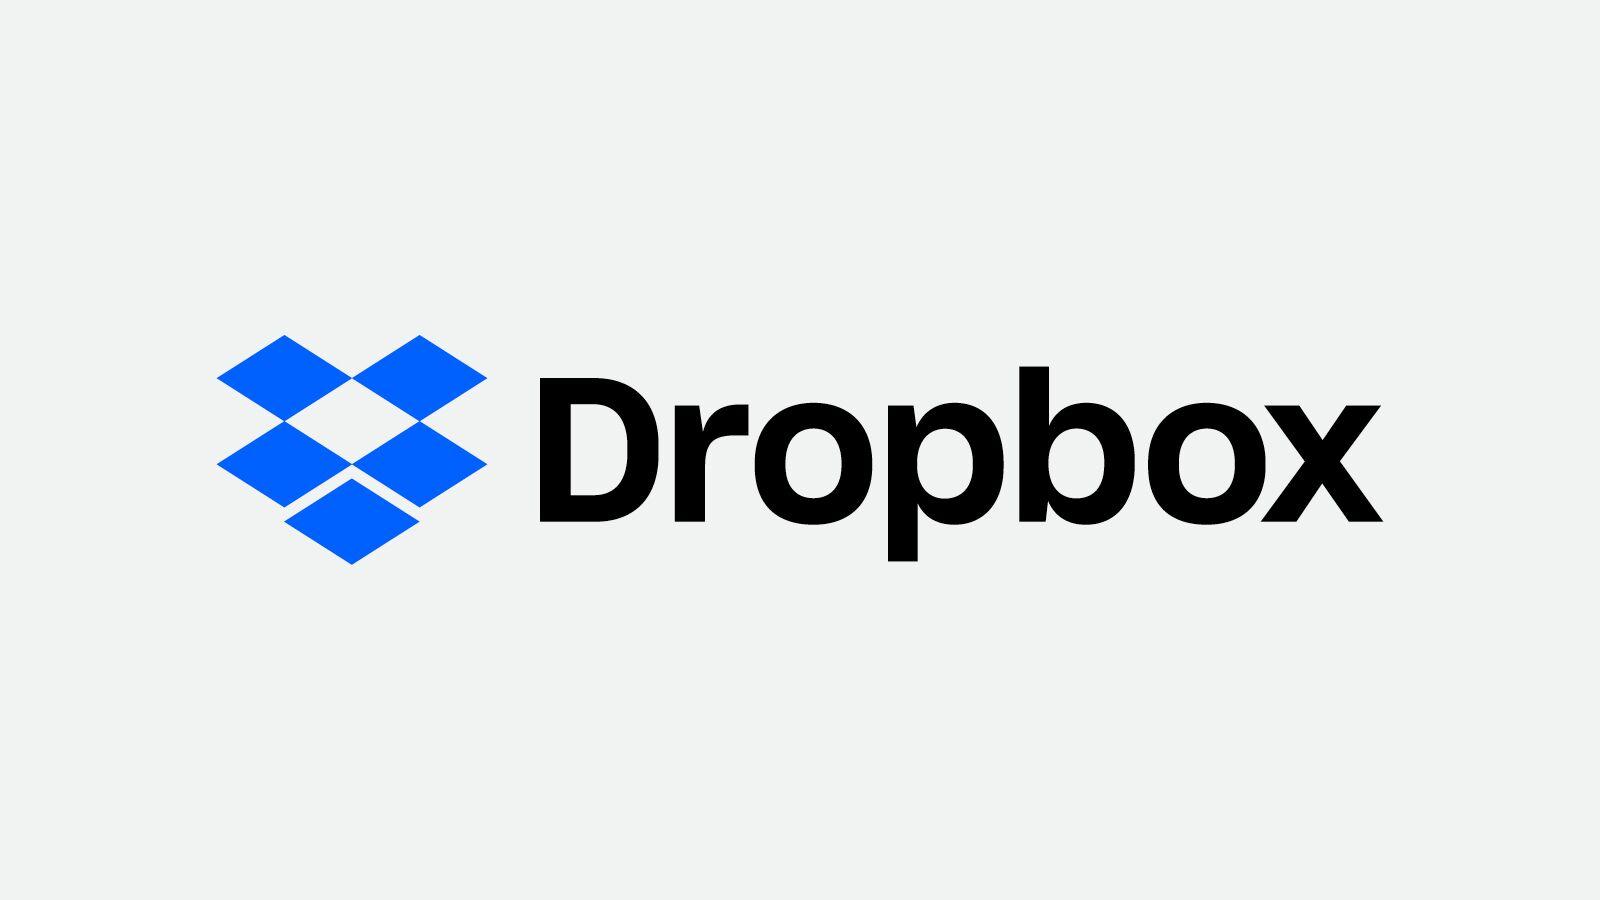 dropbox halka arz